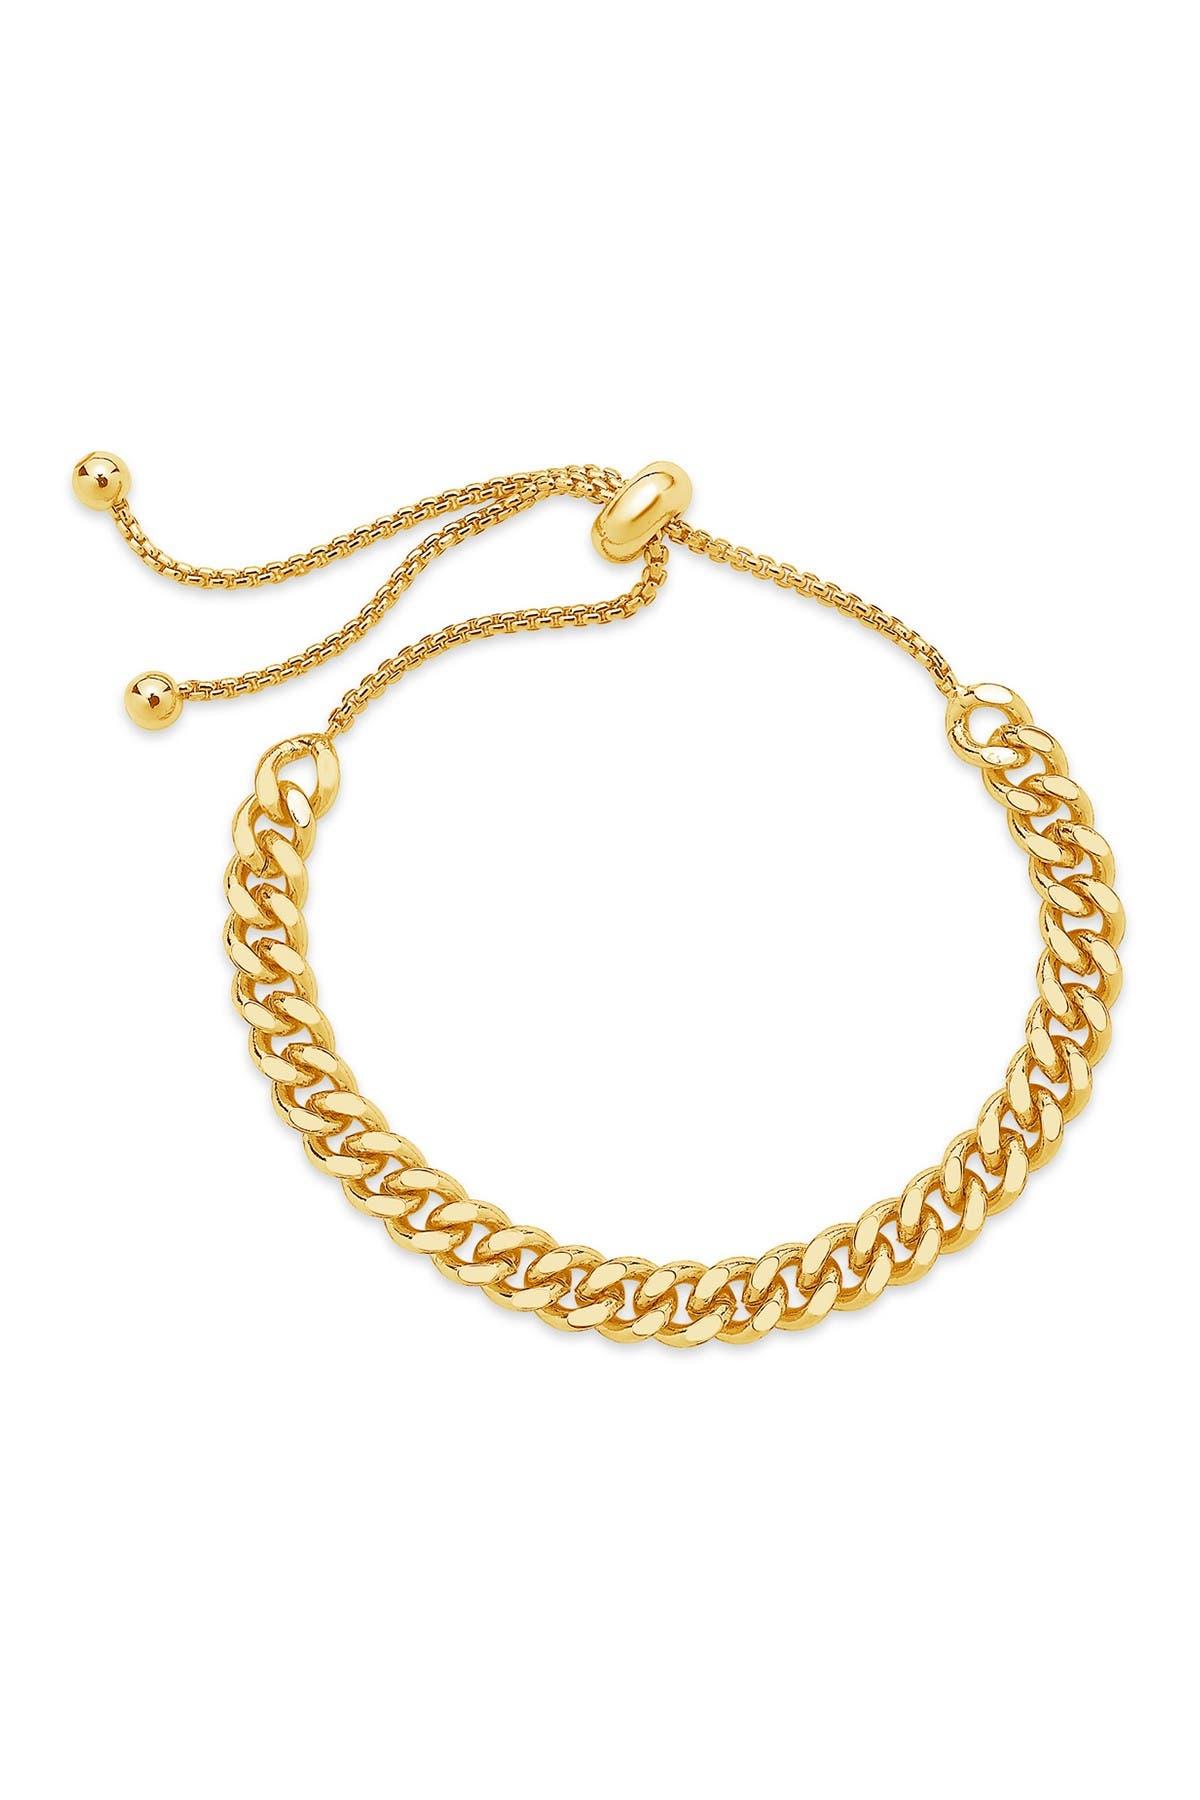 Sterling Forever Gold Plated Chain Link Bolo Bracelet